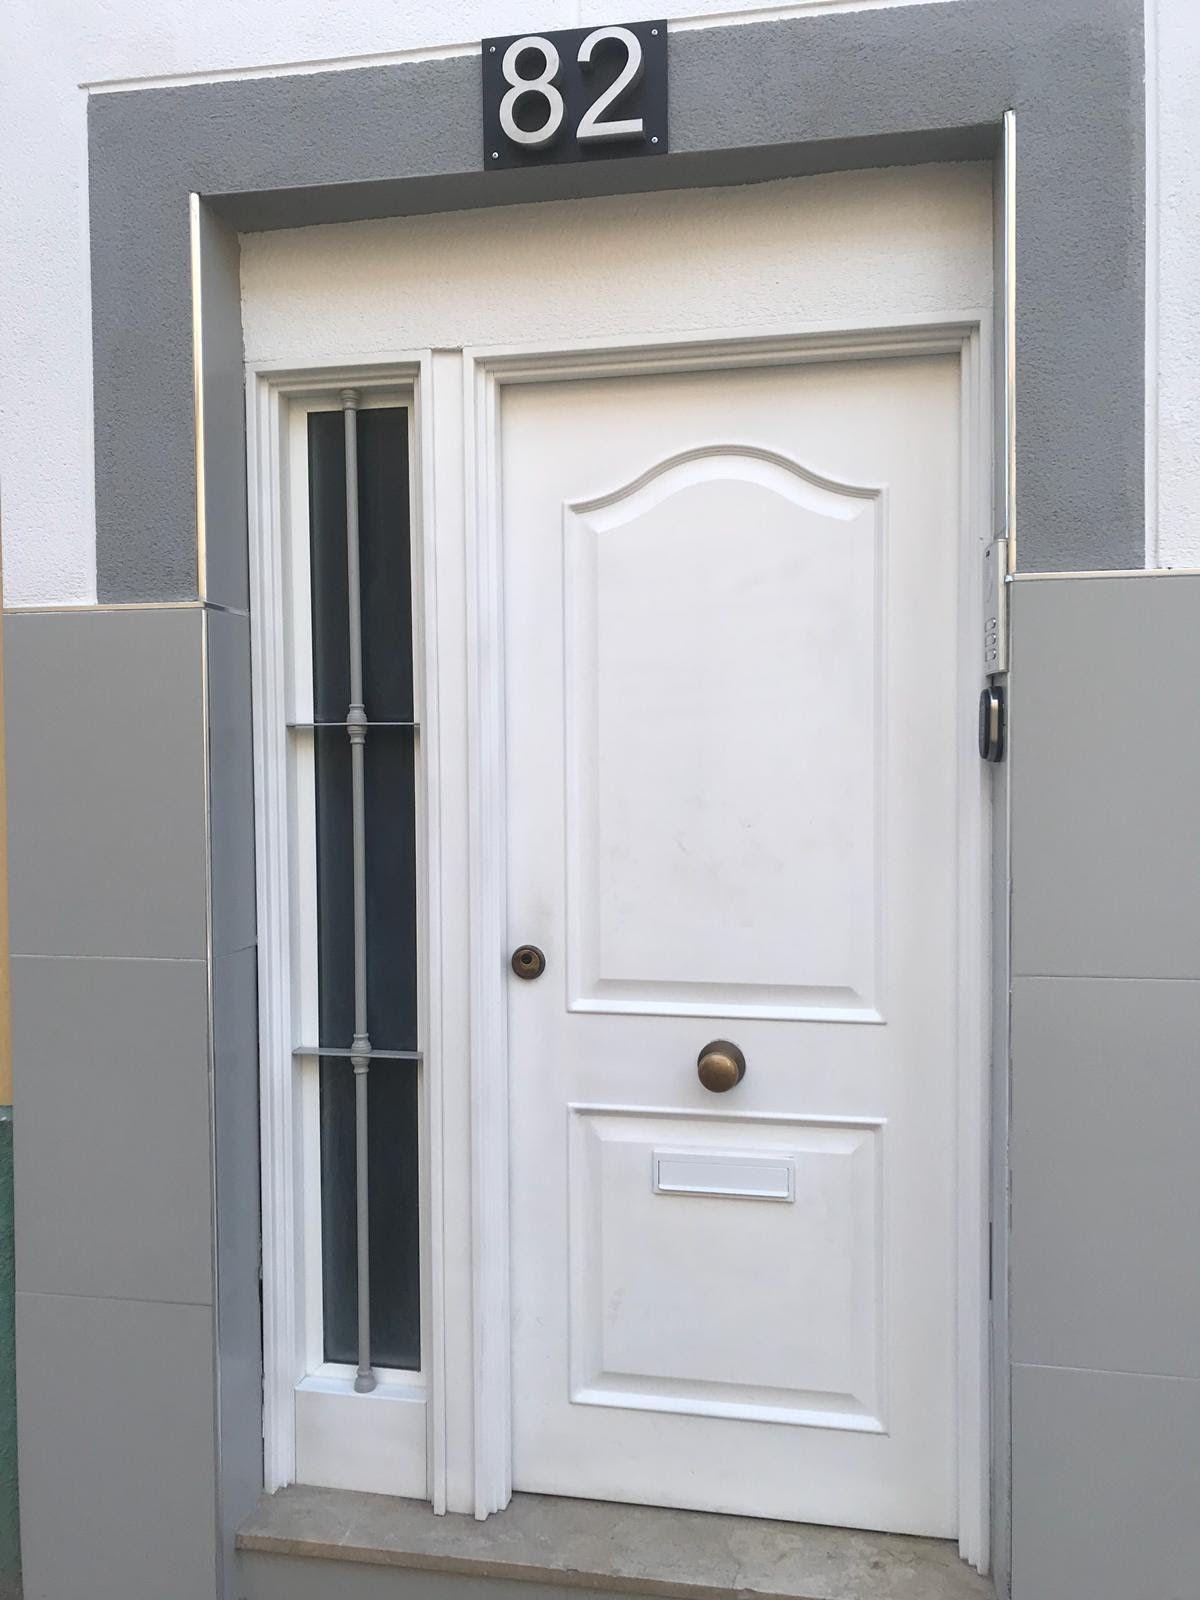 Restauración de fachadas: Servicios de Refart